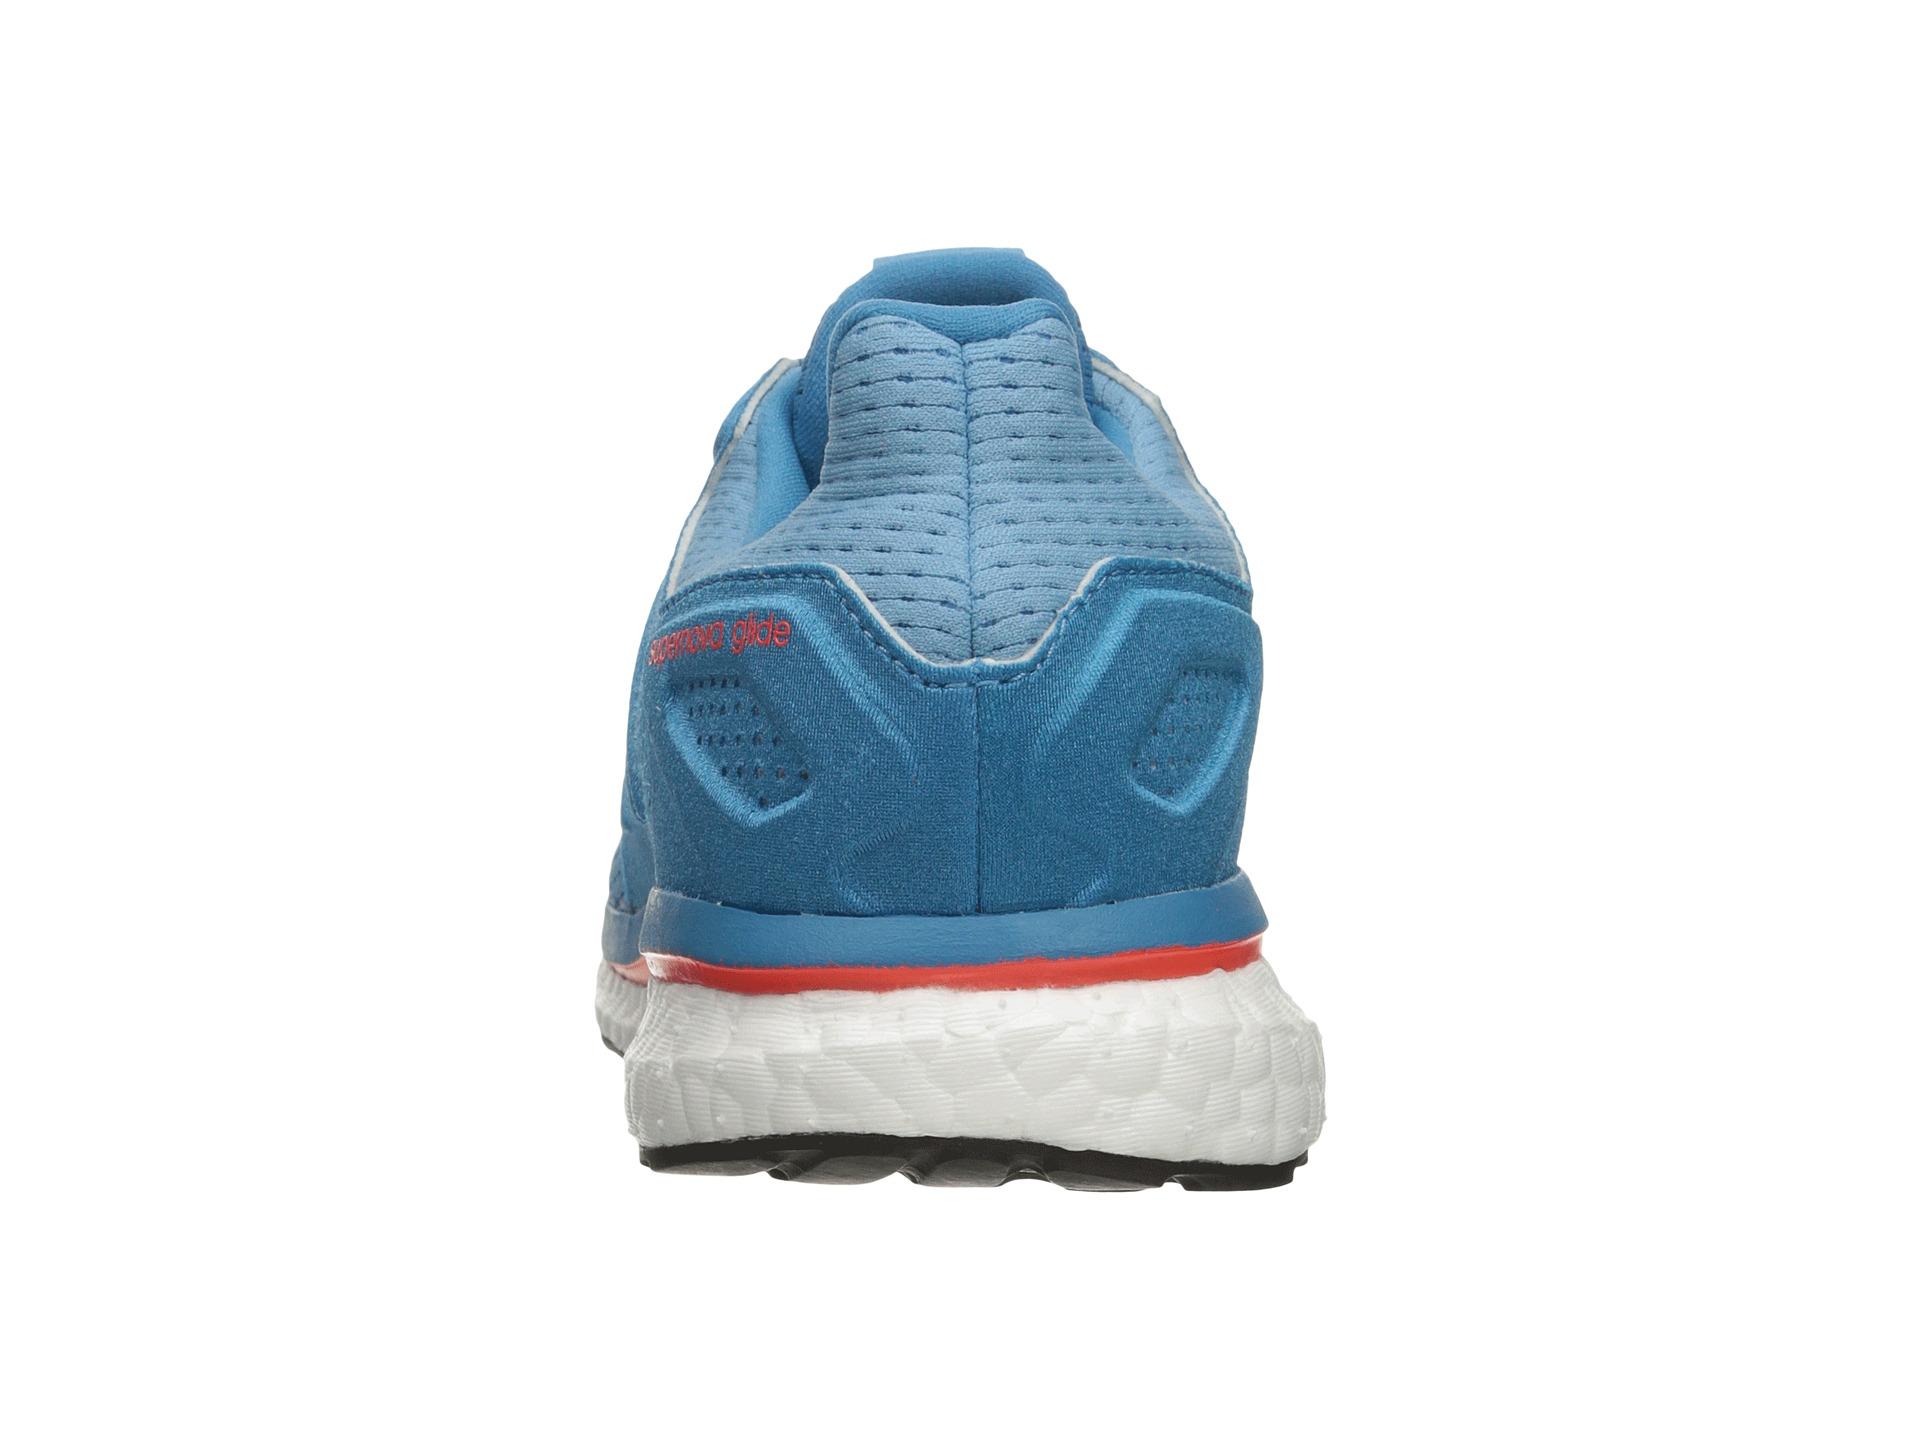 adidas Running Supernova Glide 8 at 6pm.com